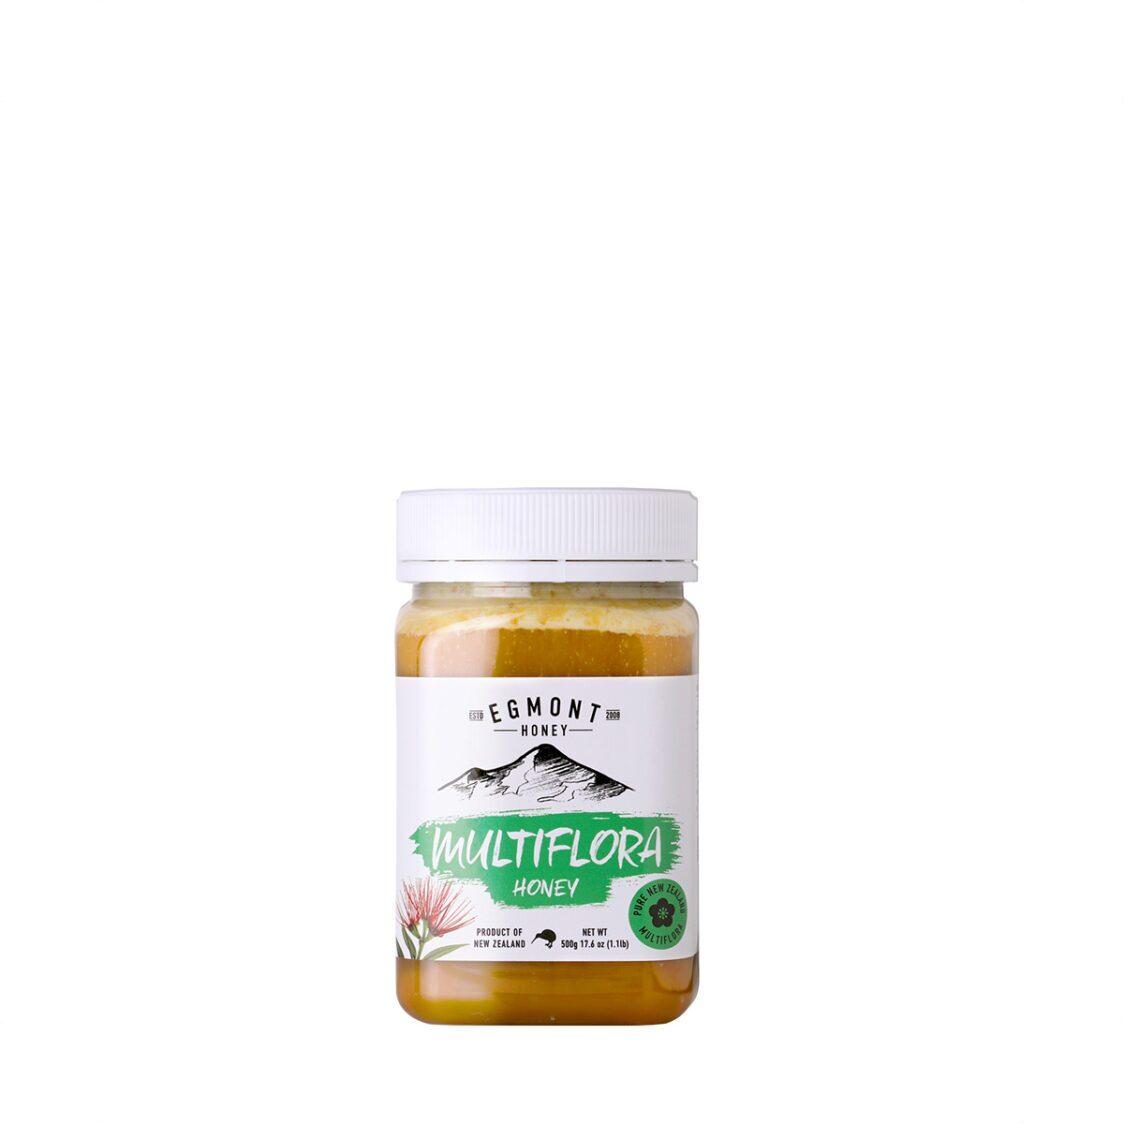 Egmont Multifloral Honey 500g UP 42